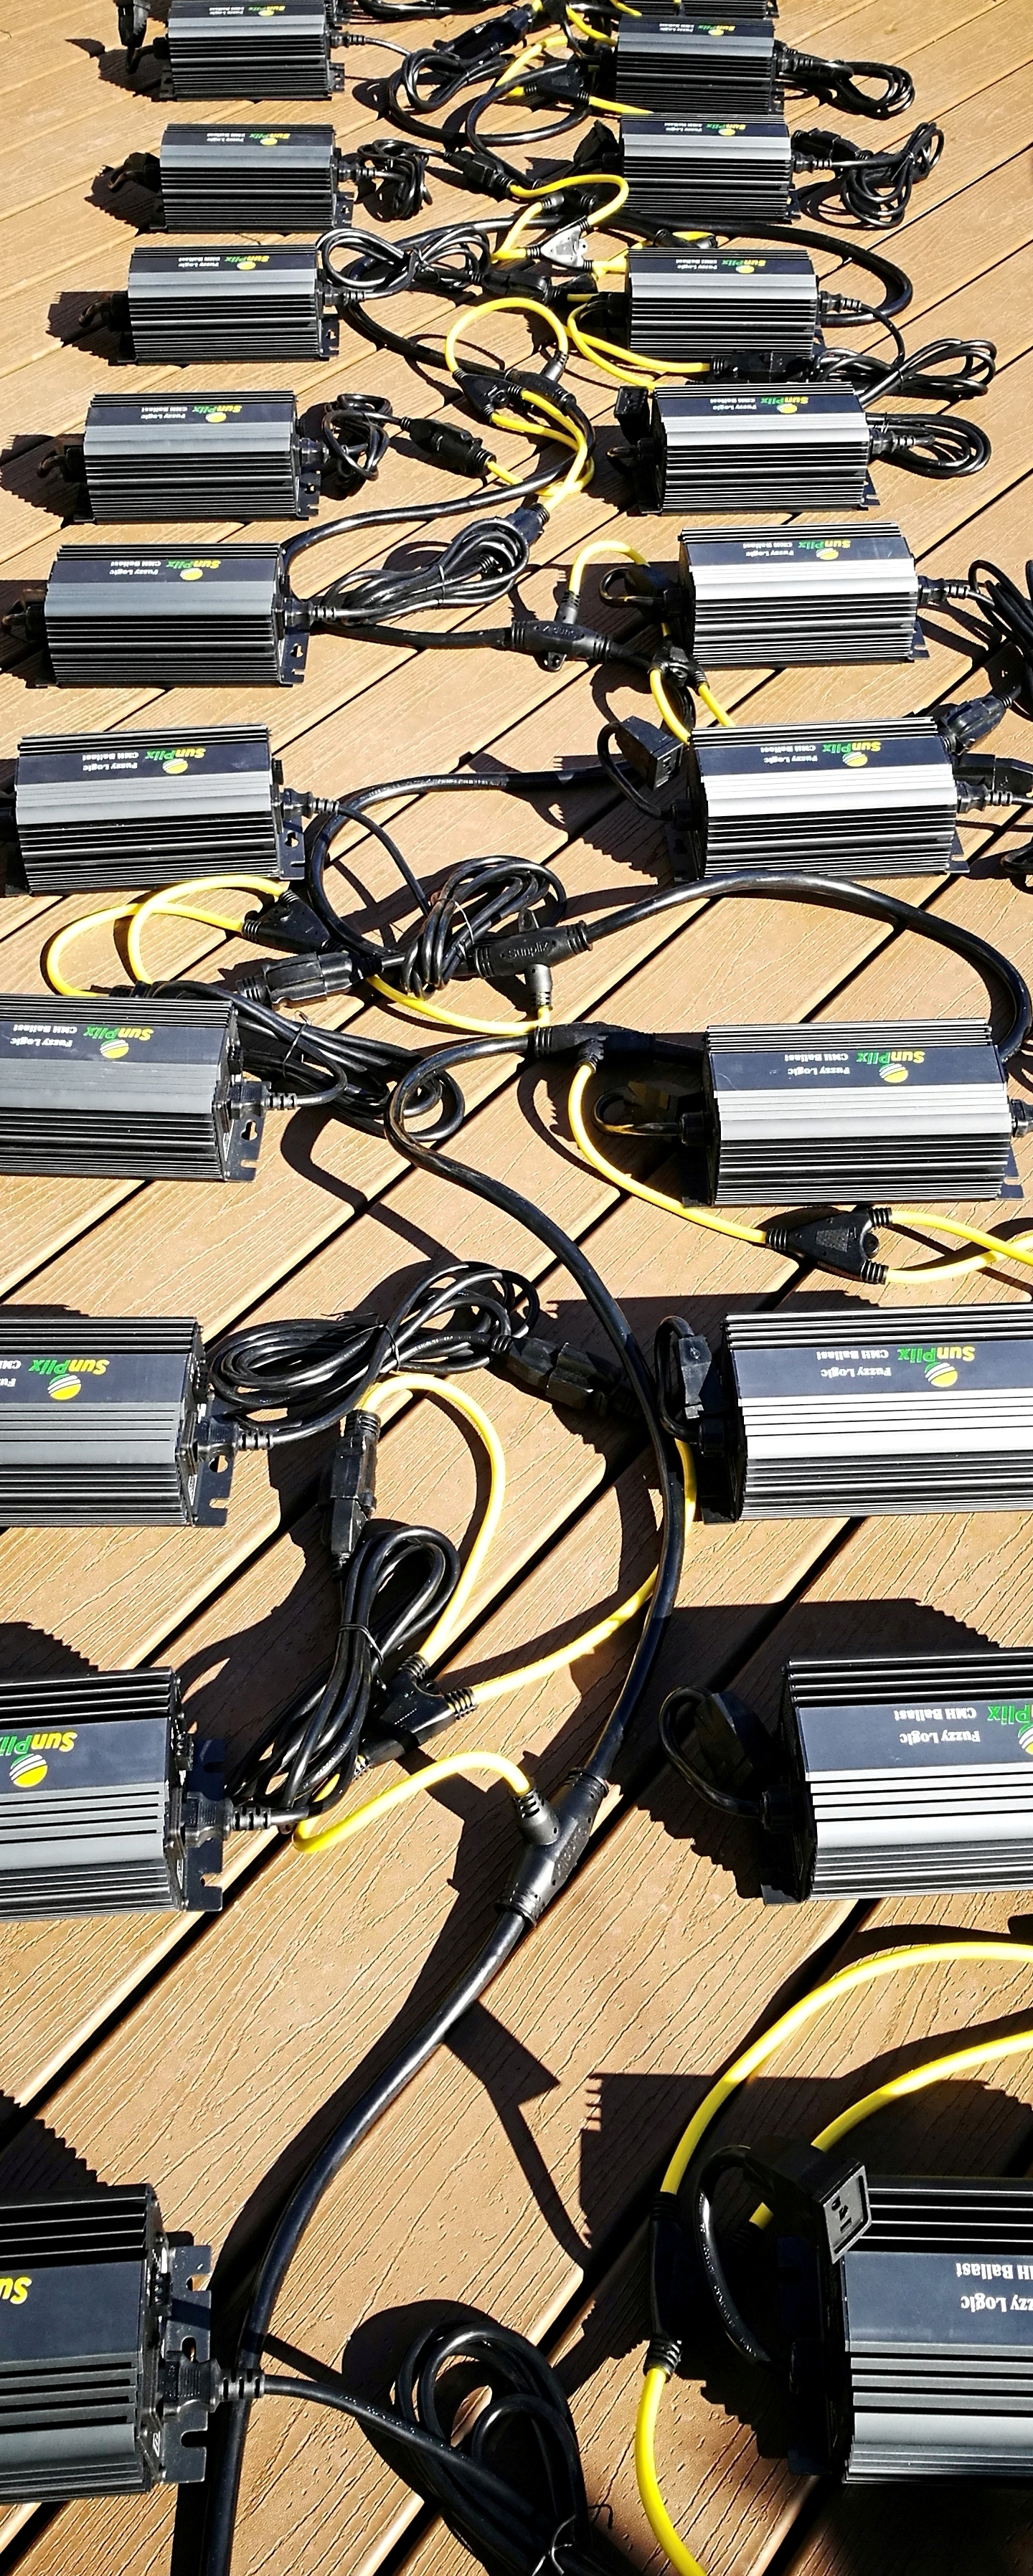 MPC-49 Daisy Chain Power Cord connecting 23 315W/240V CMH ballasts